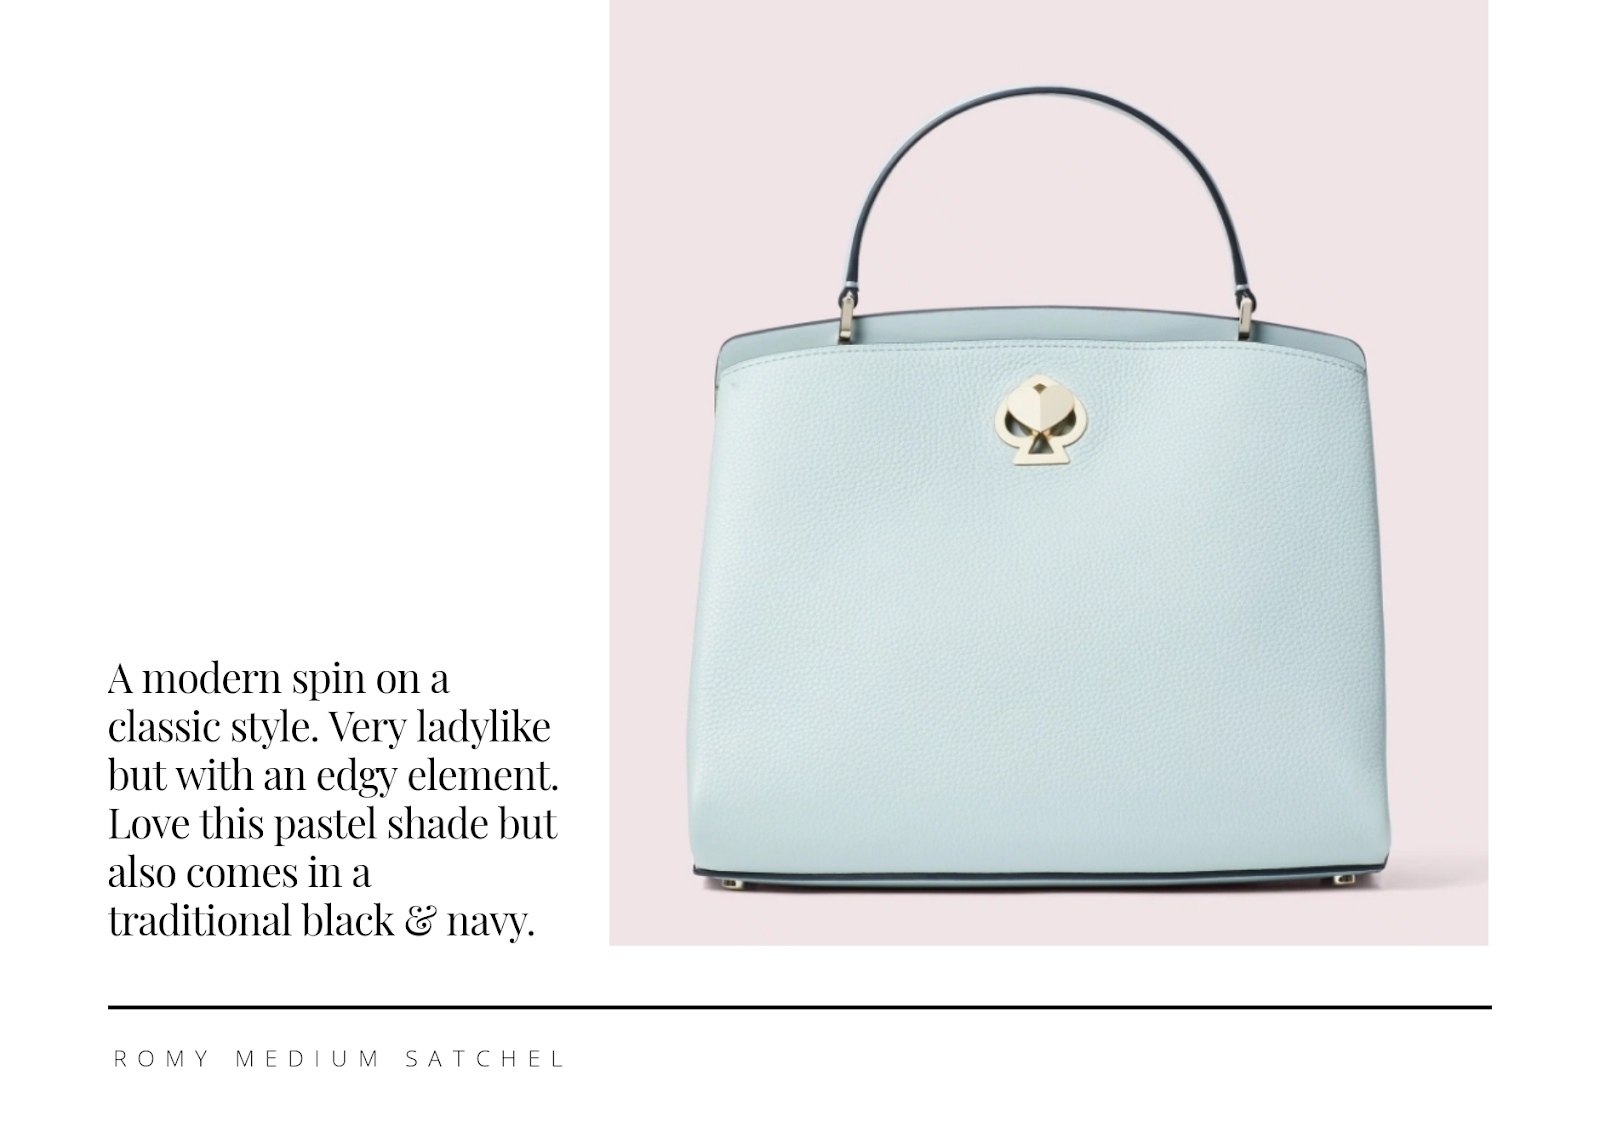 Kate Spade: Romy medium satchel